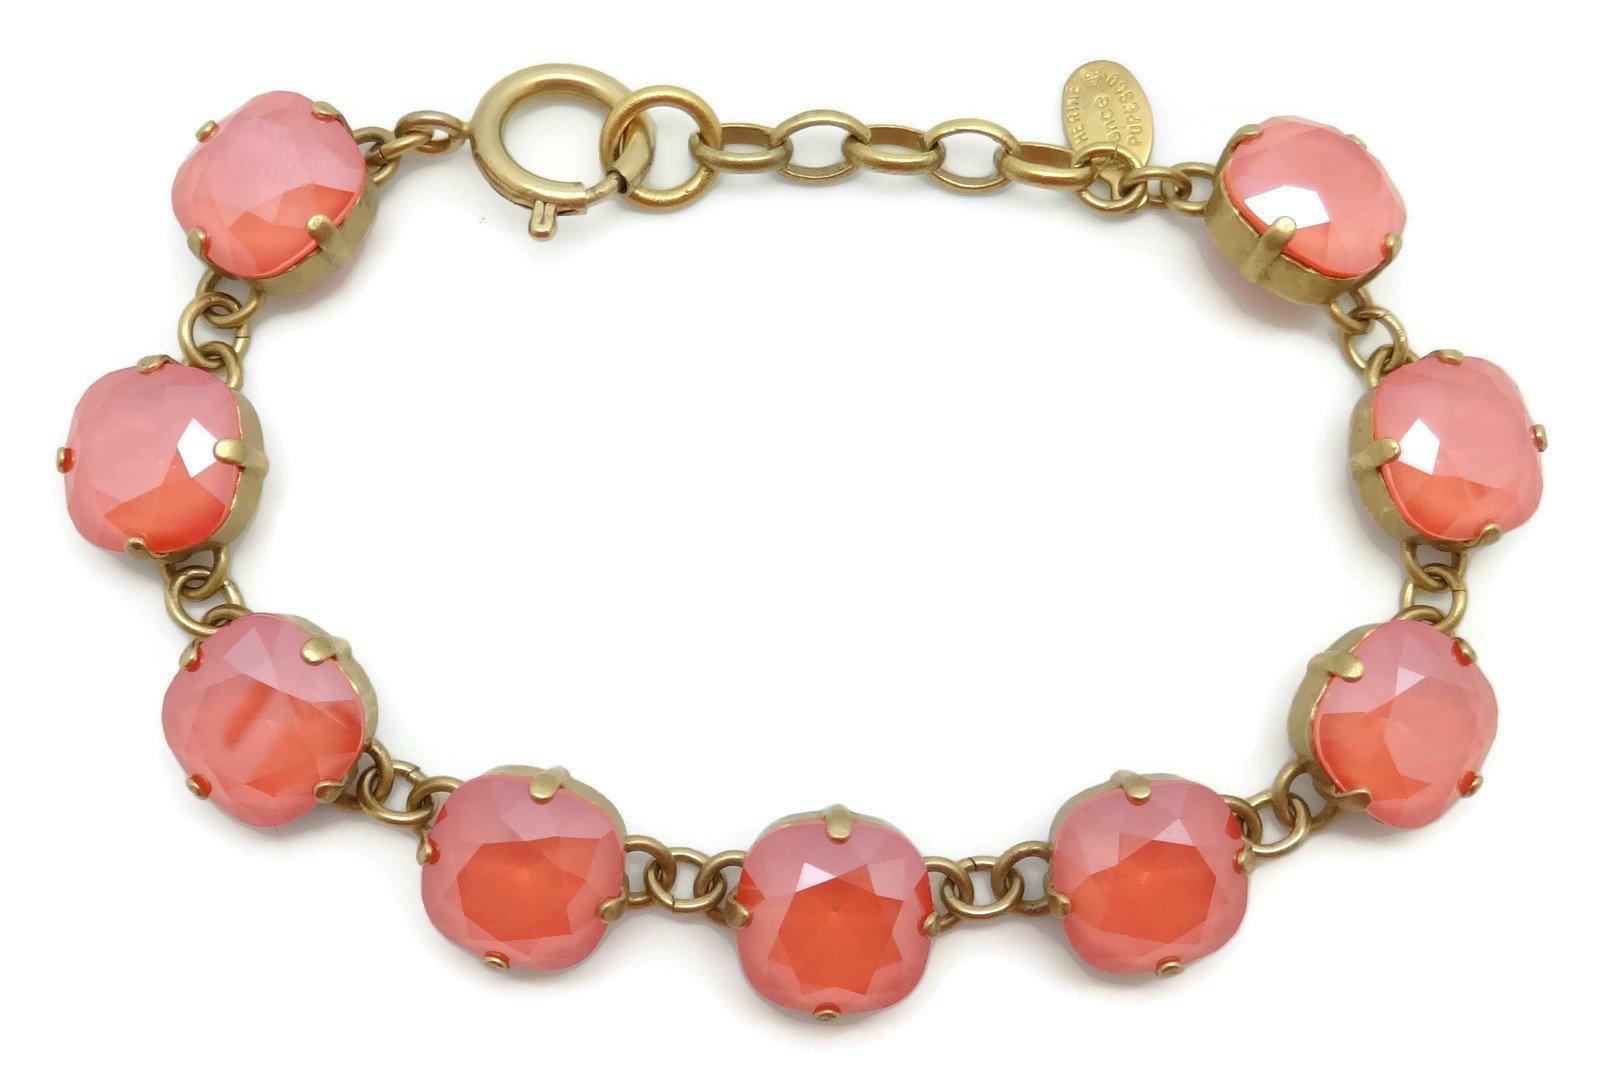 Catherine Popesco 12mm Light Coral Swarovski Crystal Gold Plated Bracelet Adjustable